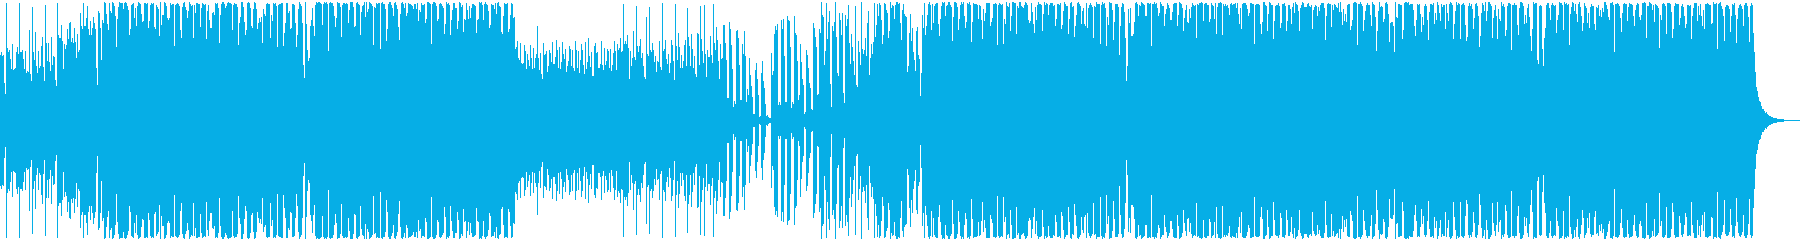 [EDM]ポップなクラブ系ハウス音楽の再生済みの波形